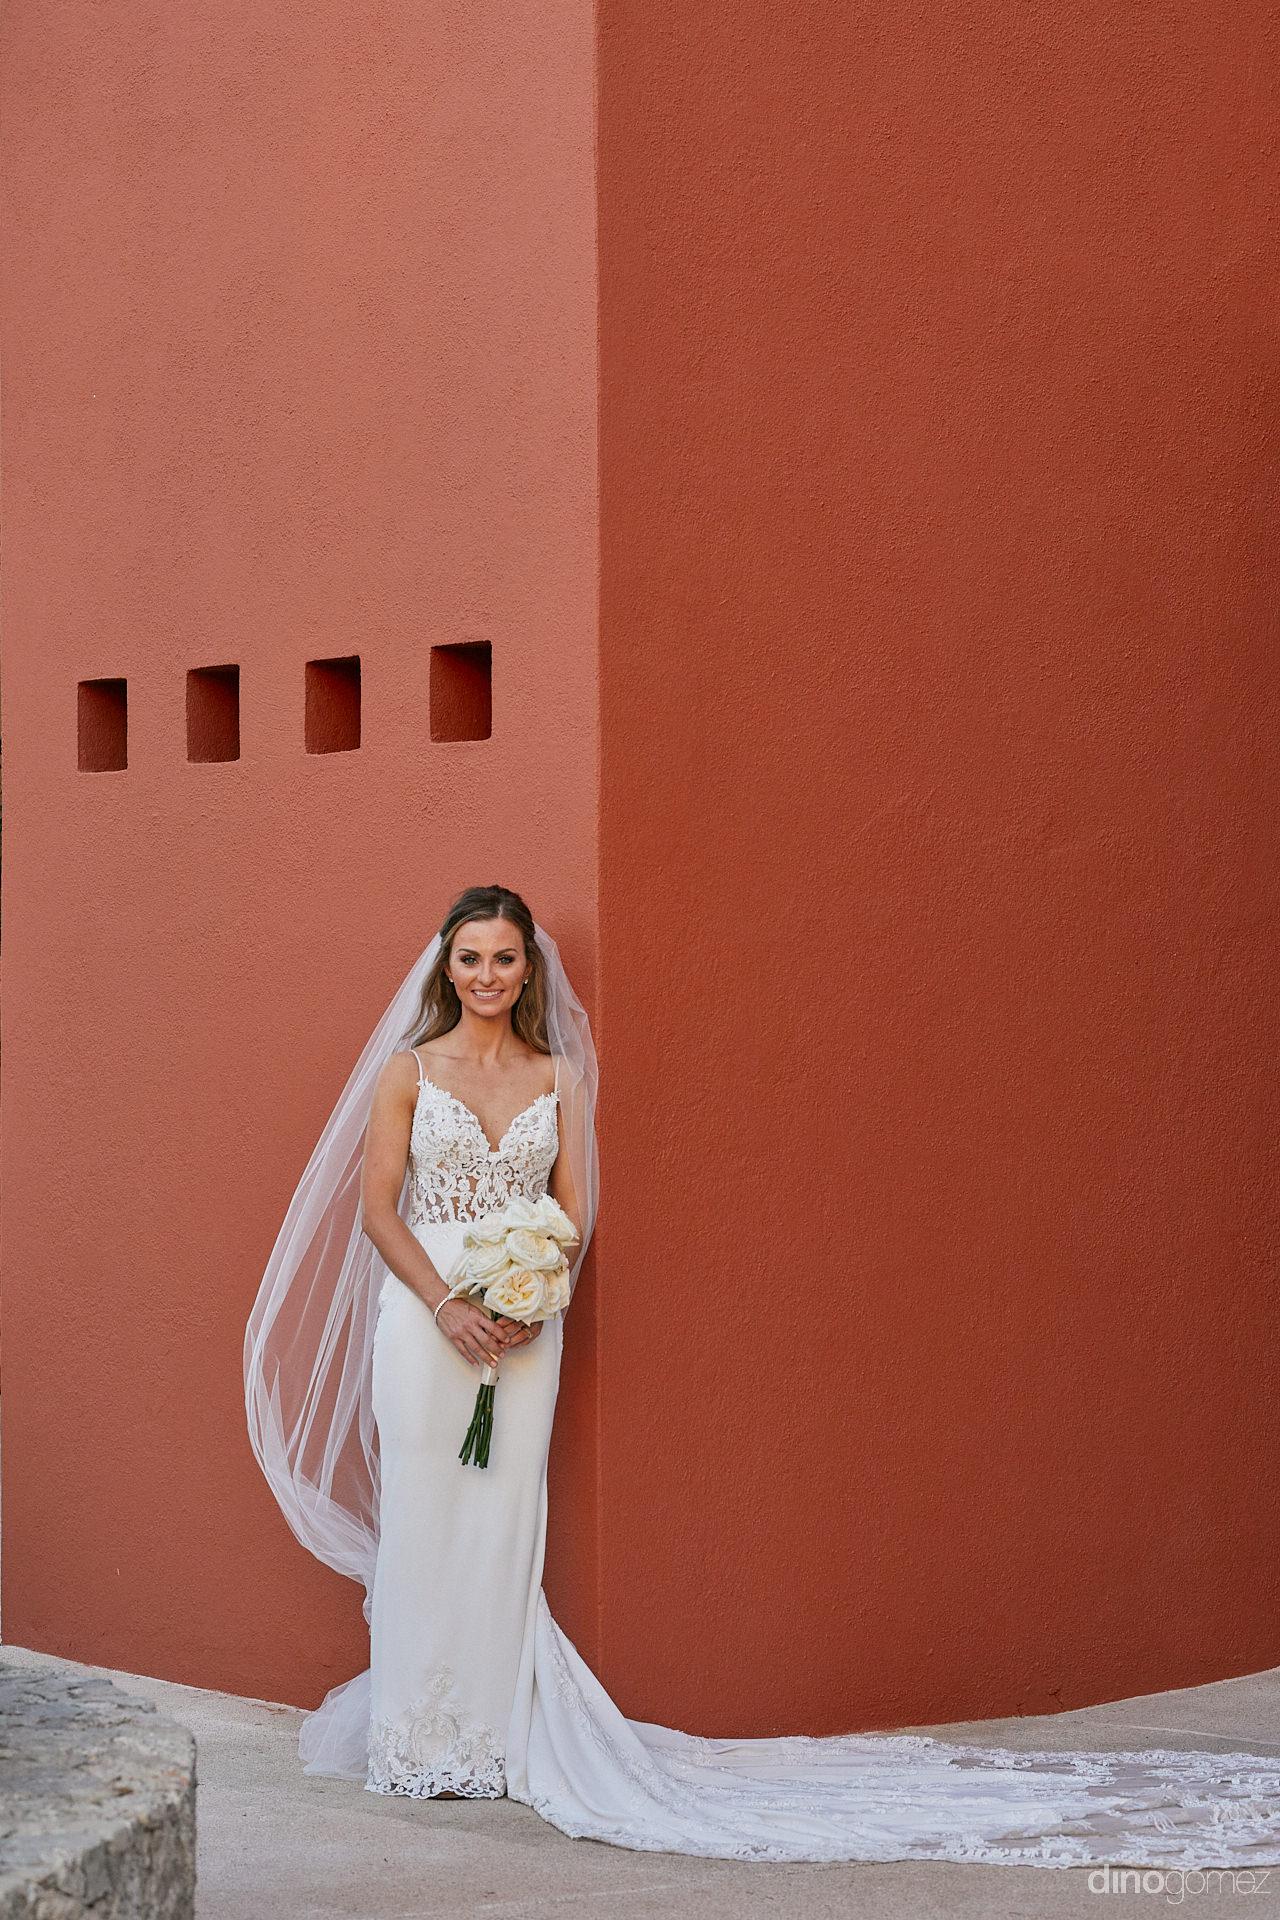 Cabo Beach Wedding - Luxury Wedding Photographer In Cabo Dino Gomez - C&T